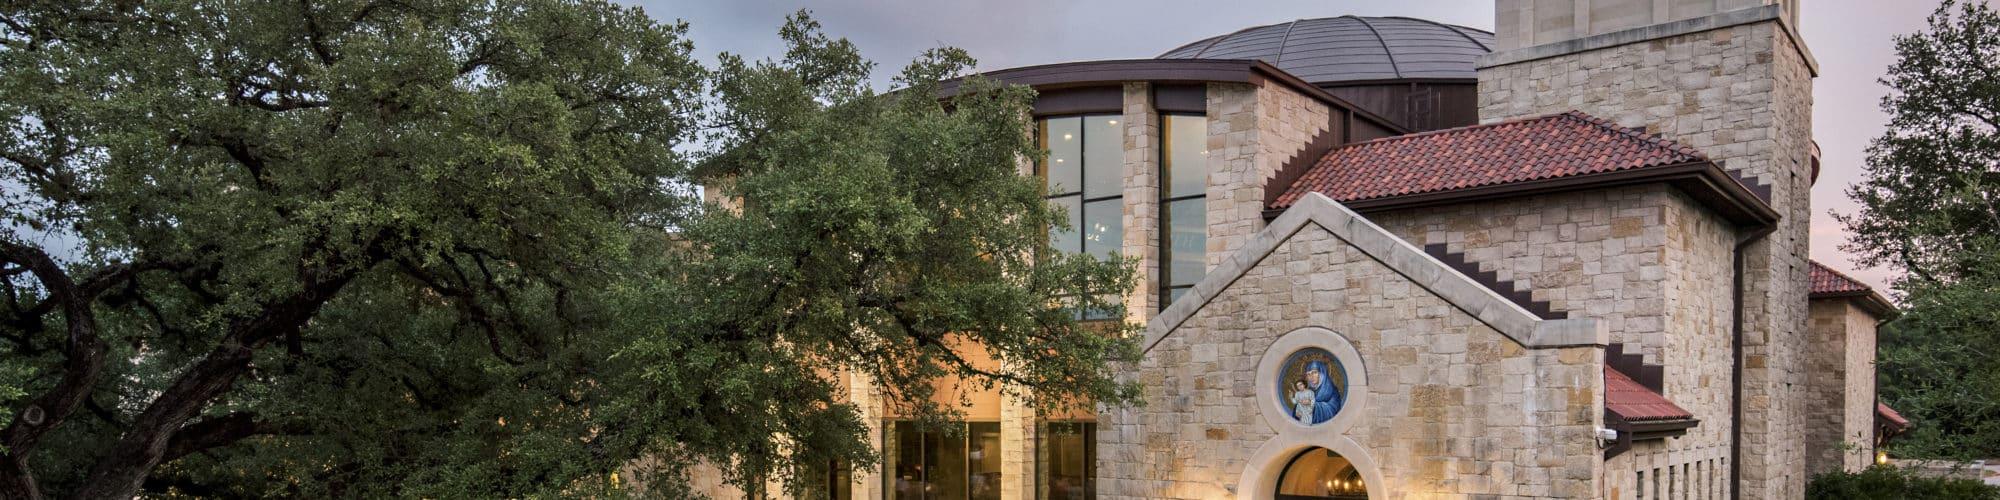 St. John Neumann Catholic Church | Exterior - AQUILA Project Management Case Study